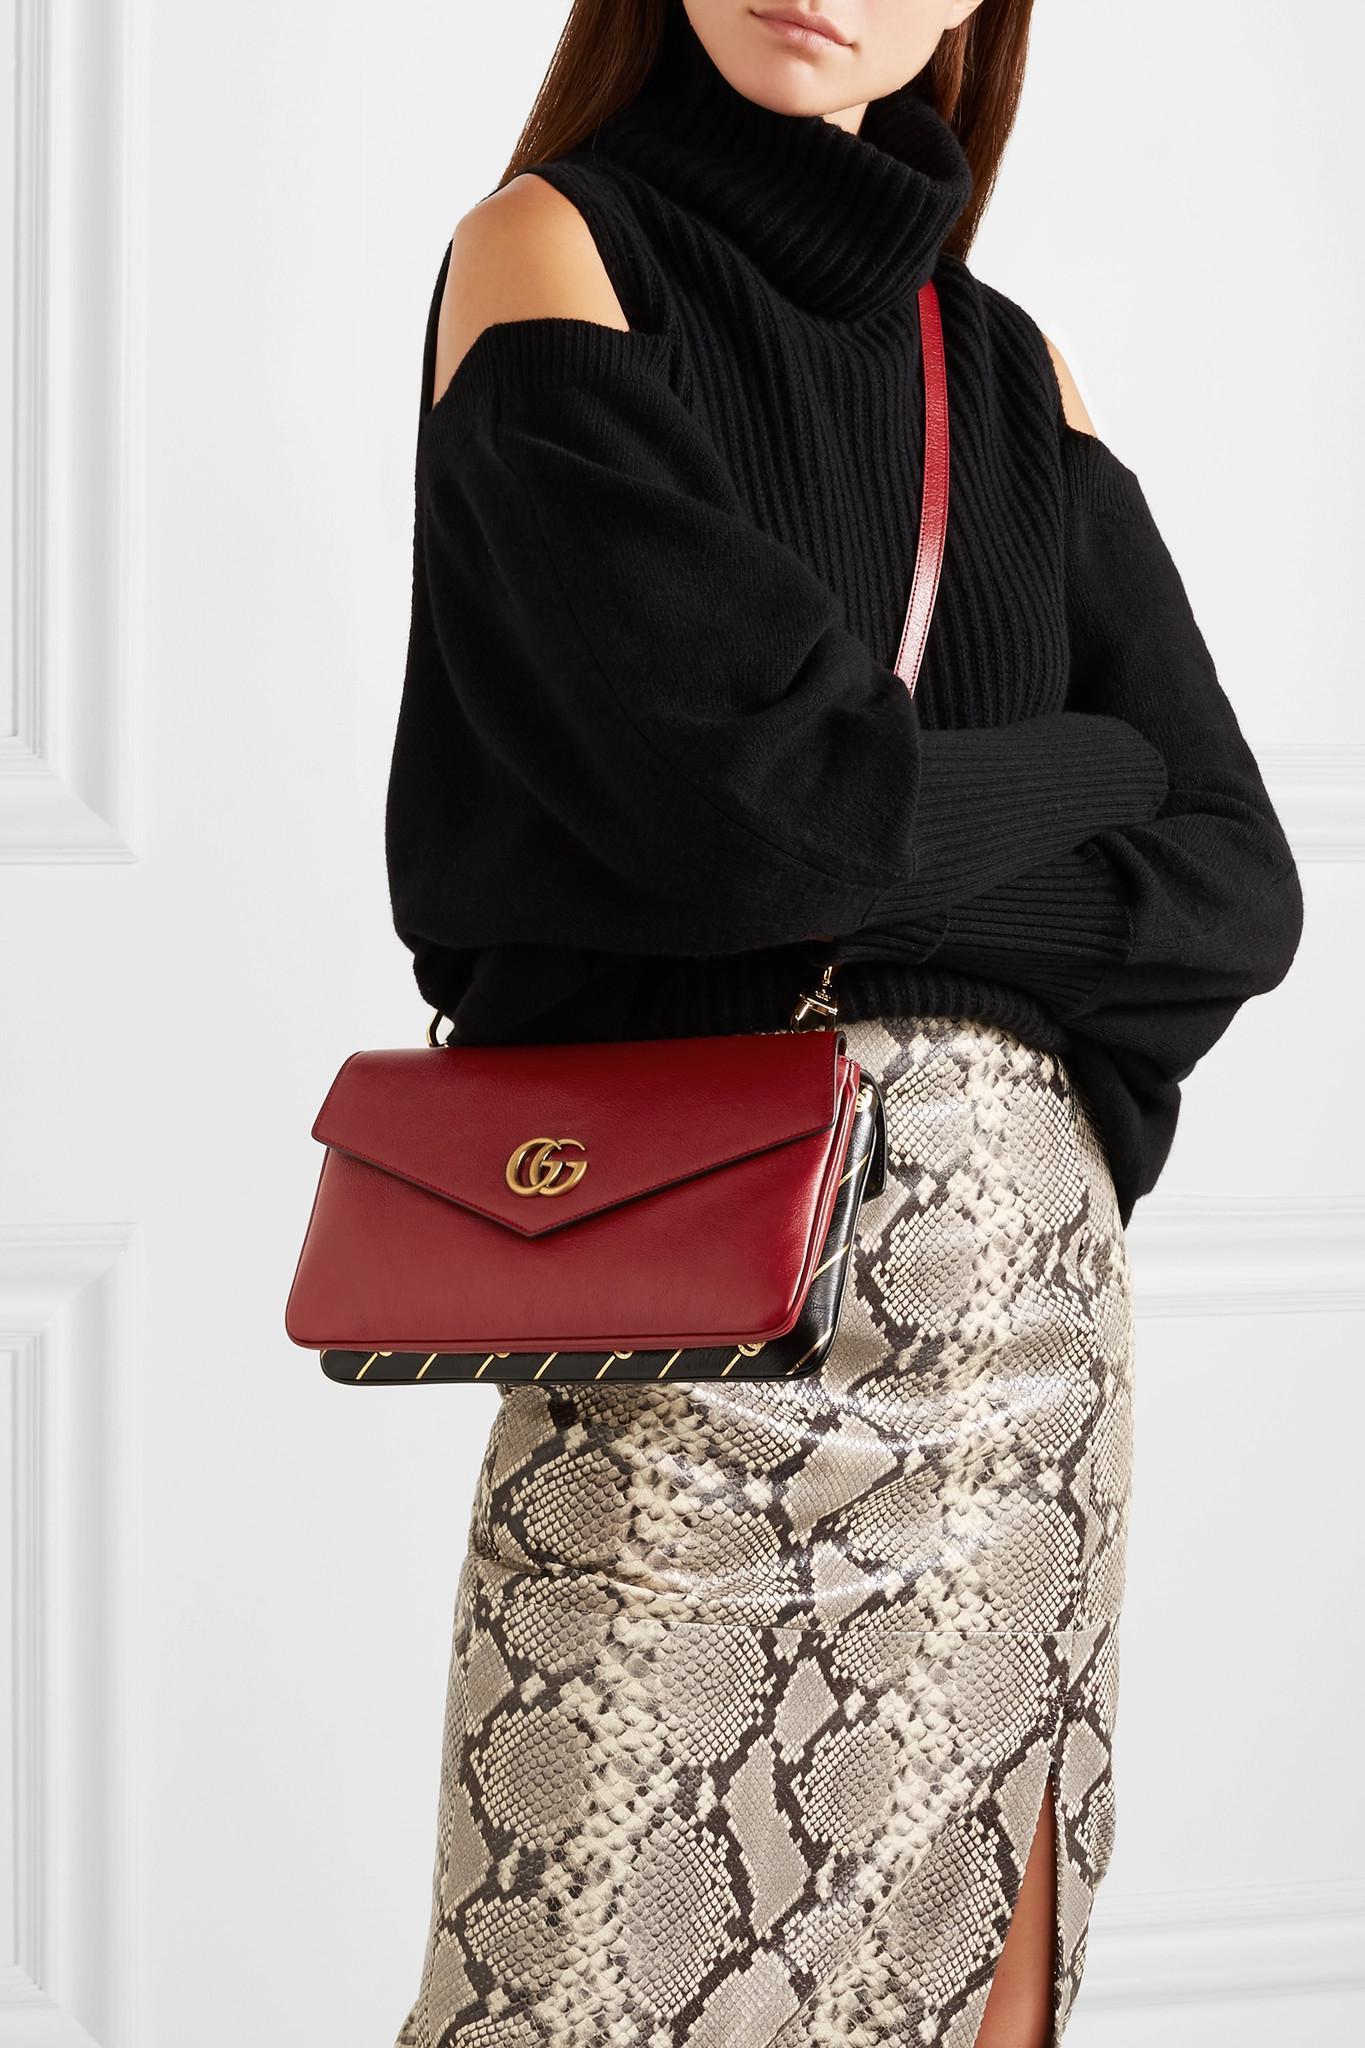 e59646ff363 ... Thiara Embellished Printed Leather Shoulder Bag - Lyst. View fullscreen